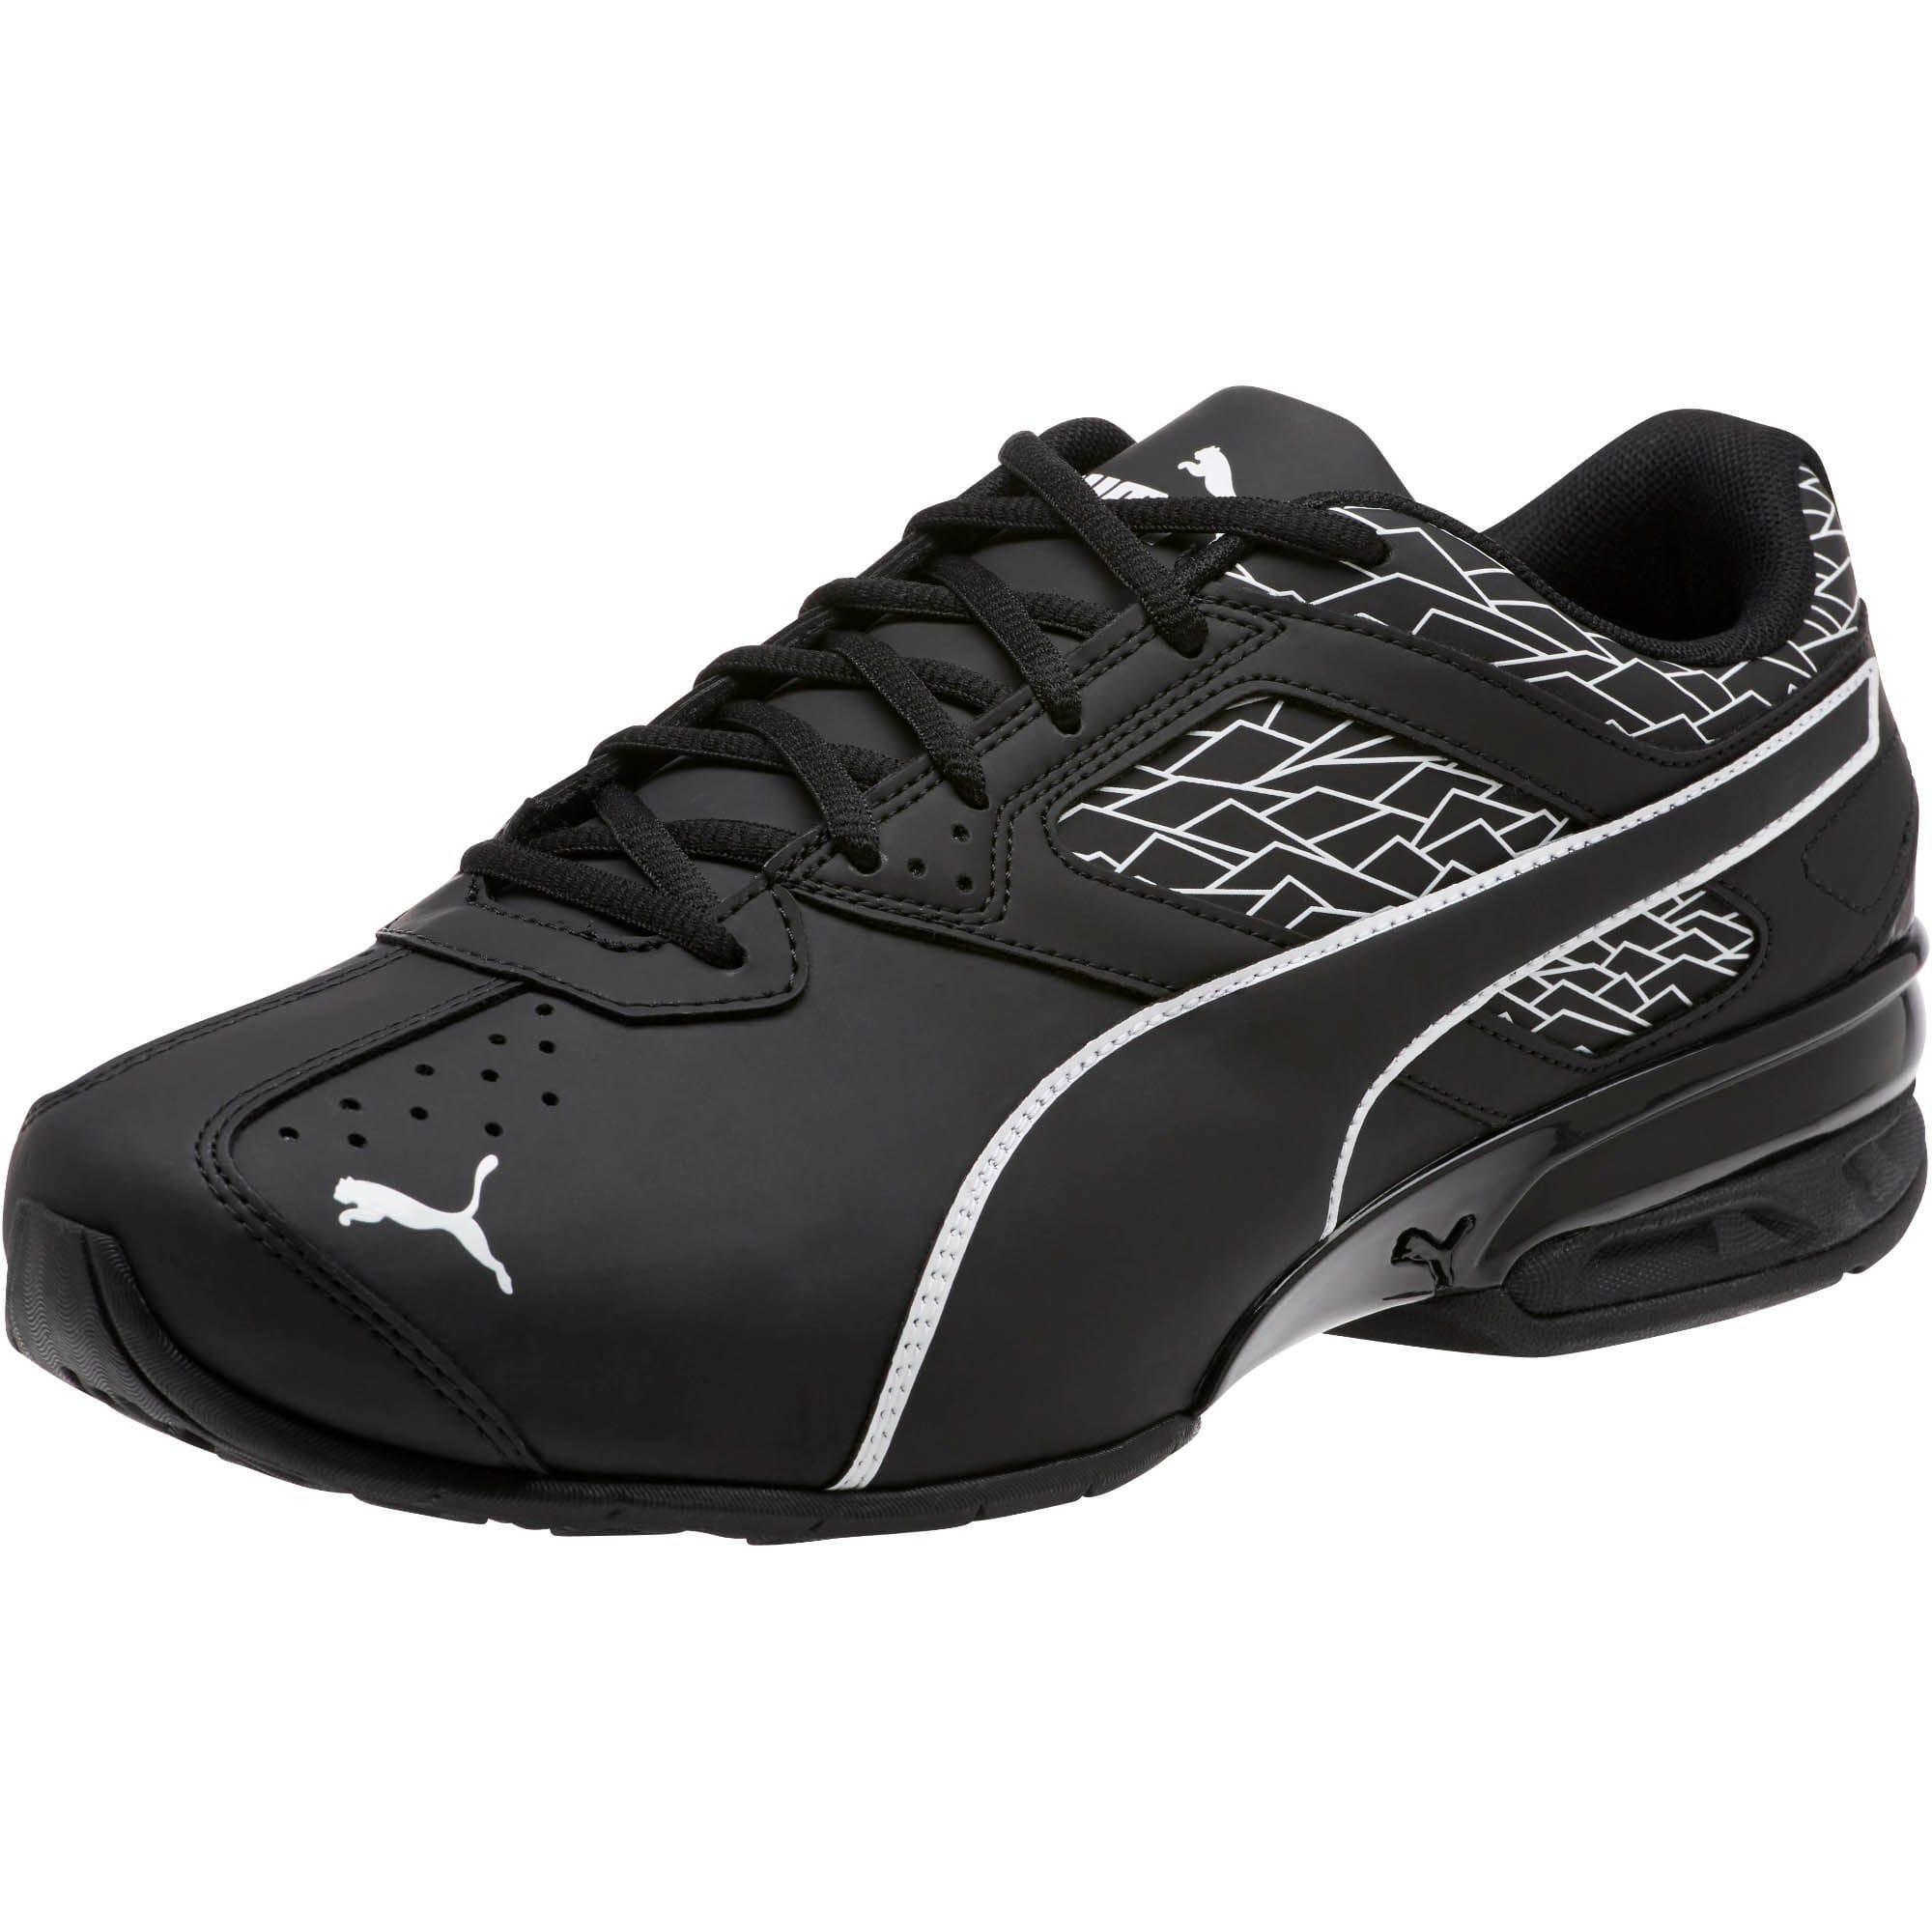 Thumbnail 1 of Tazon 6 Fracture FM Wide Men's Sneakers, Puma Black-Puma Black, medium